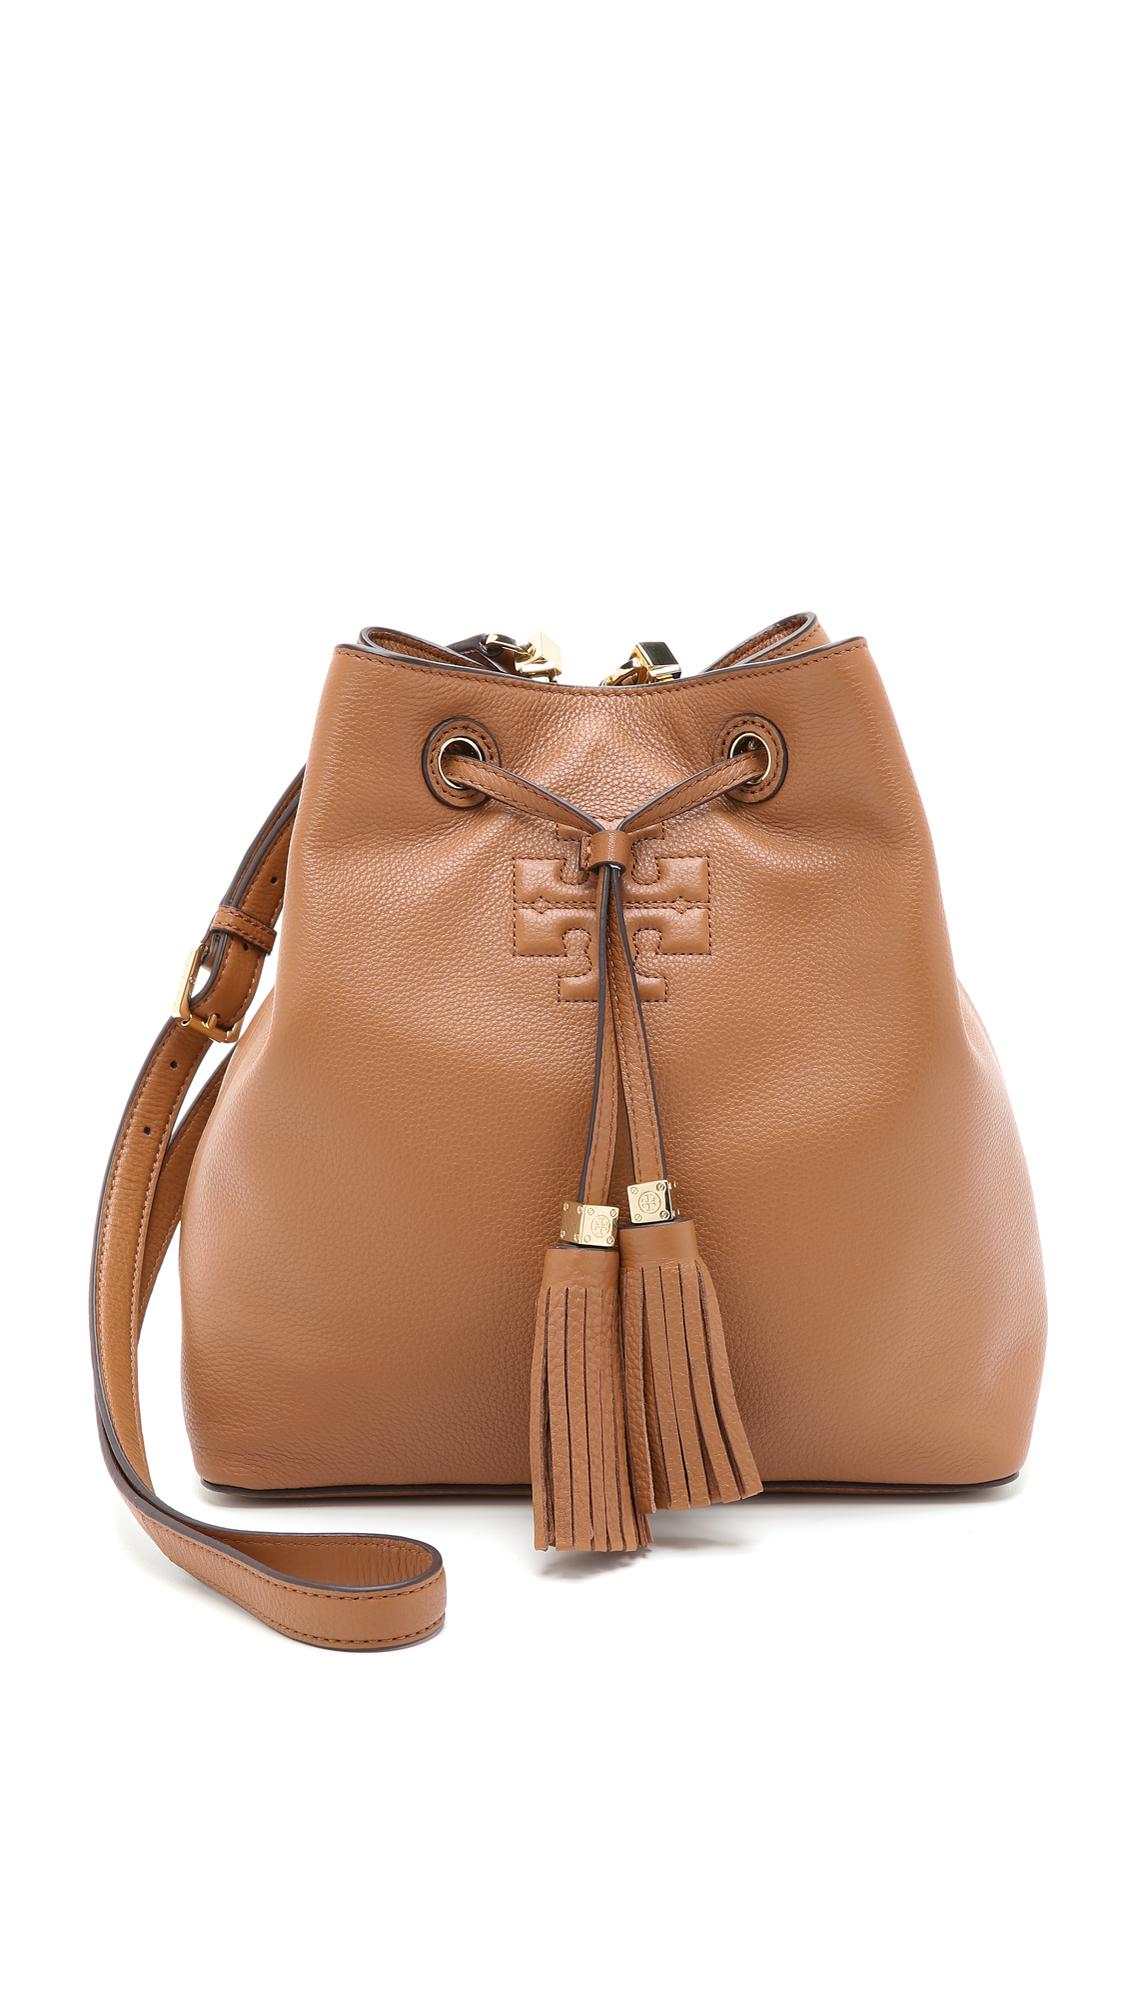 9c661d5b3e5 Lyst - Tory Burch Thea Bucket Bag - Bark in Brown